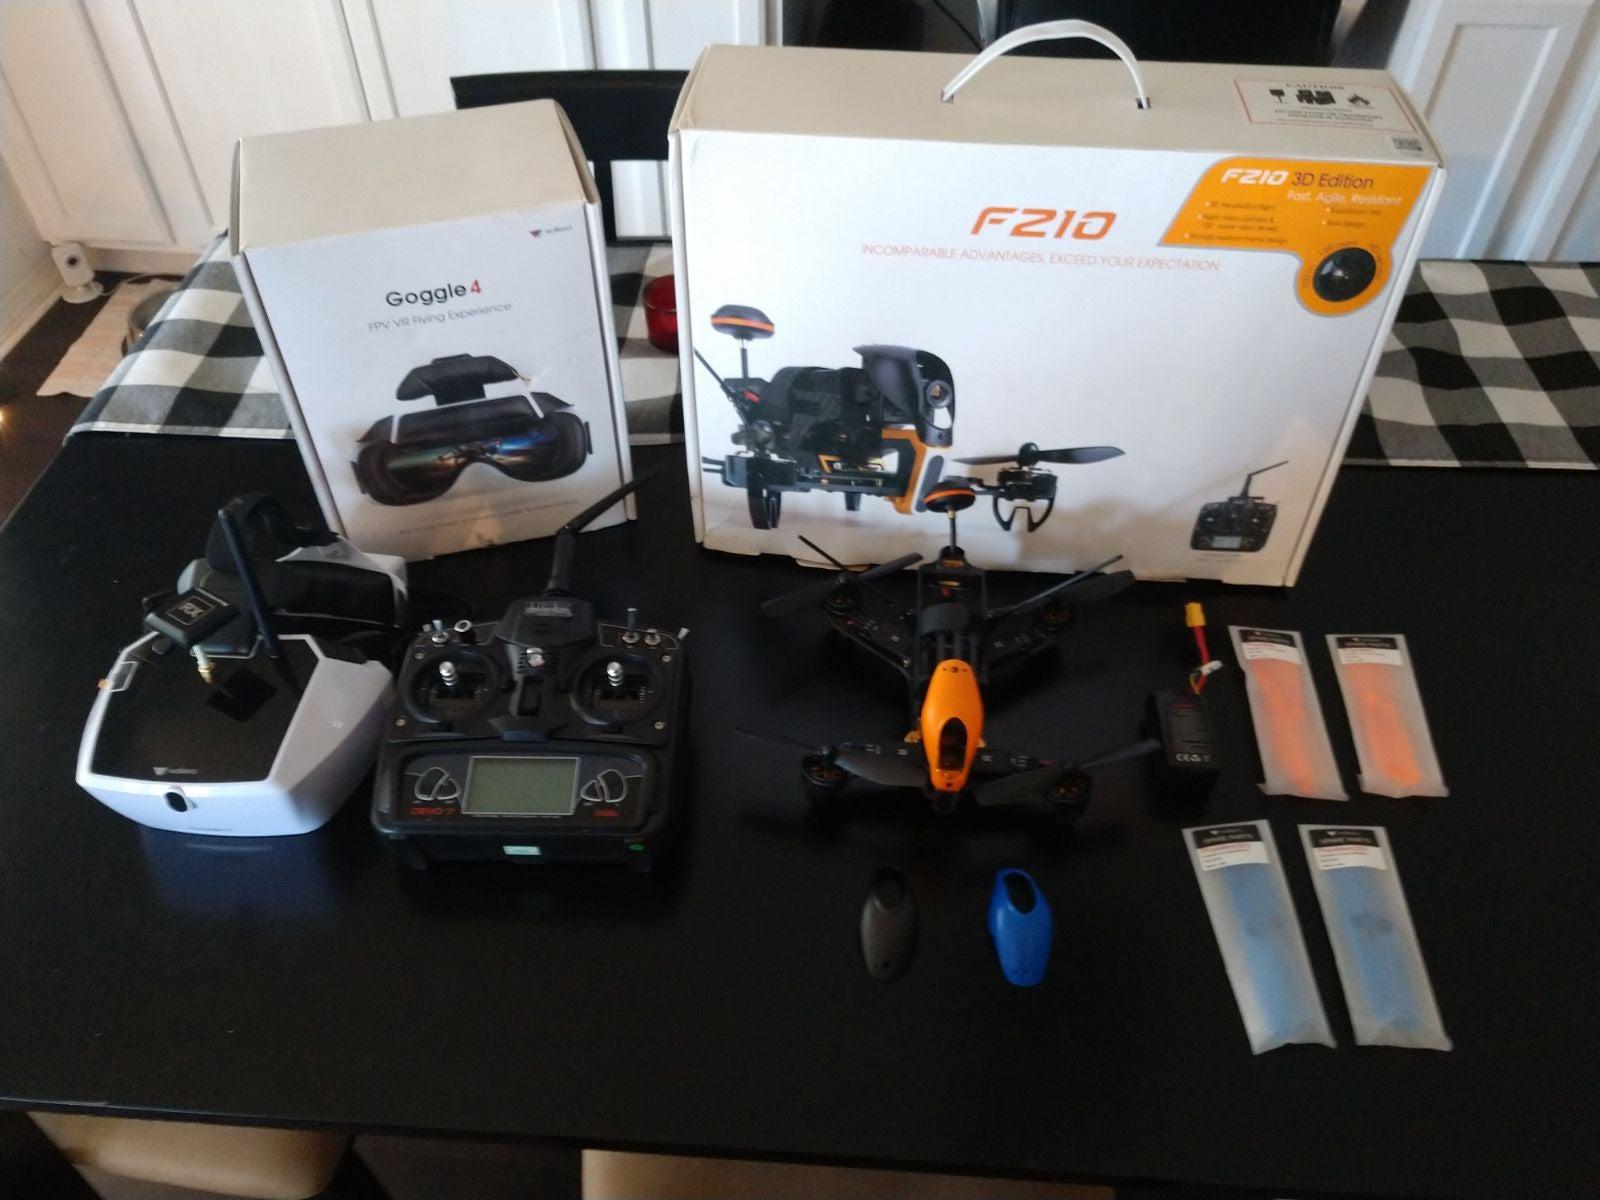 Walkera F210 Quadcopter and FPV Goggles